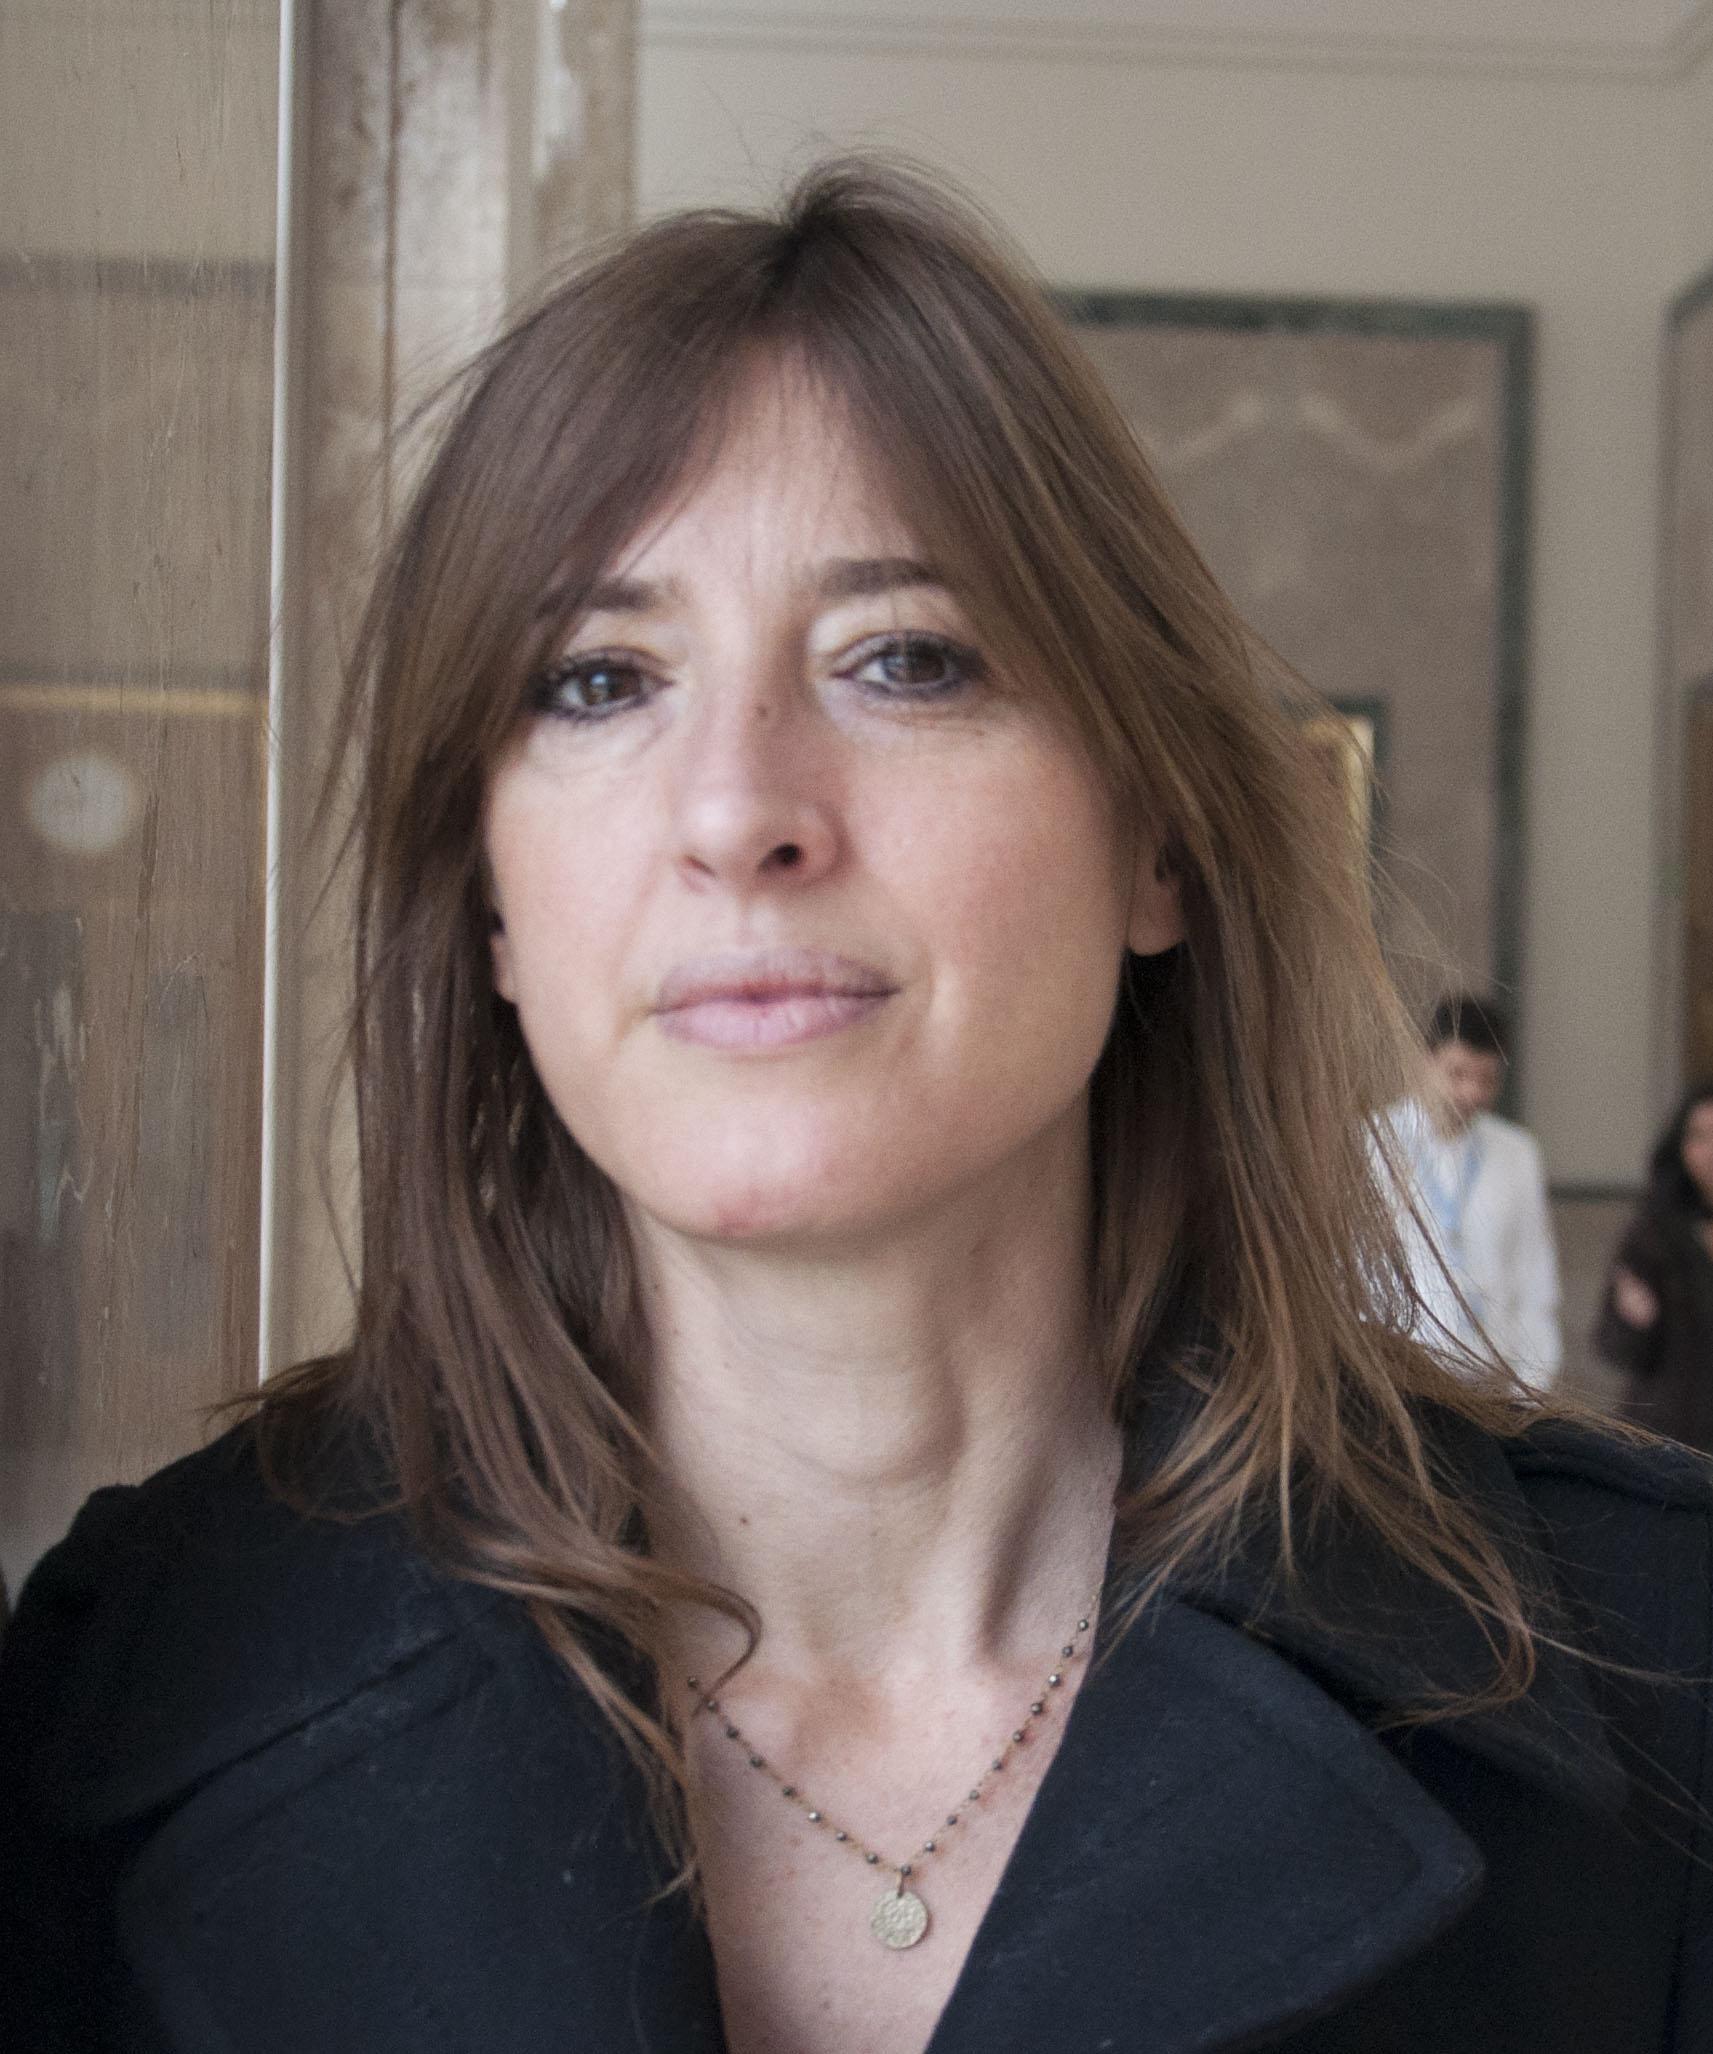 Carolina Pardal (España)